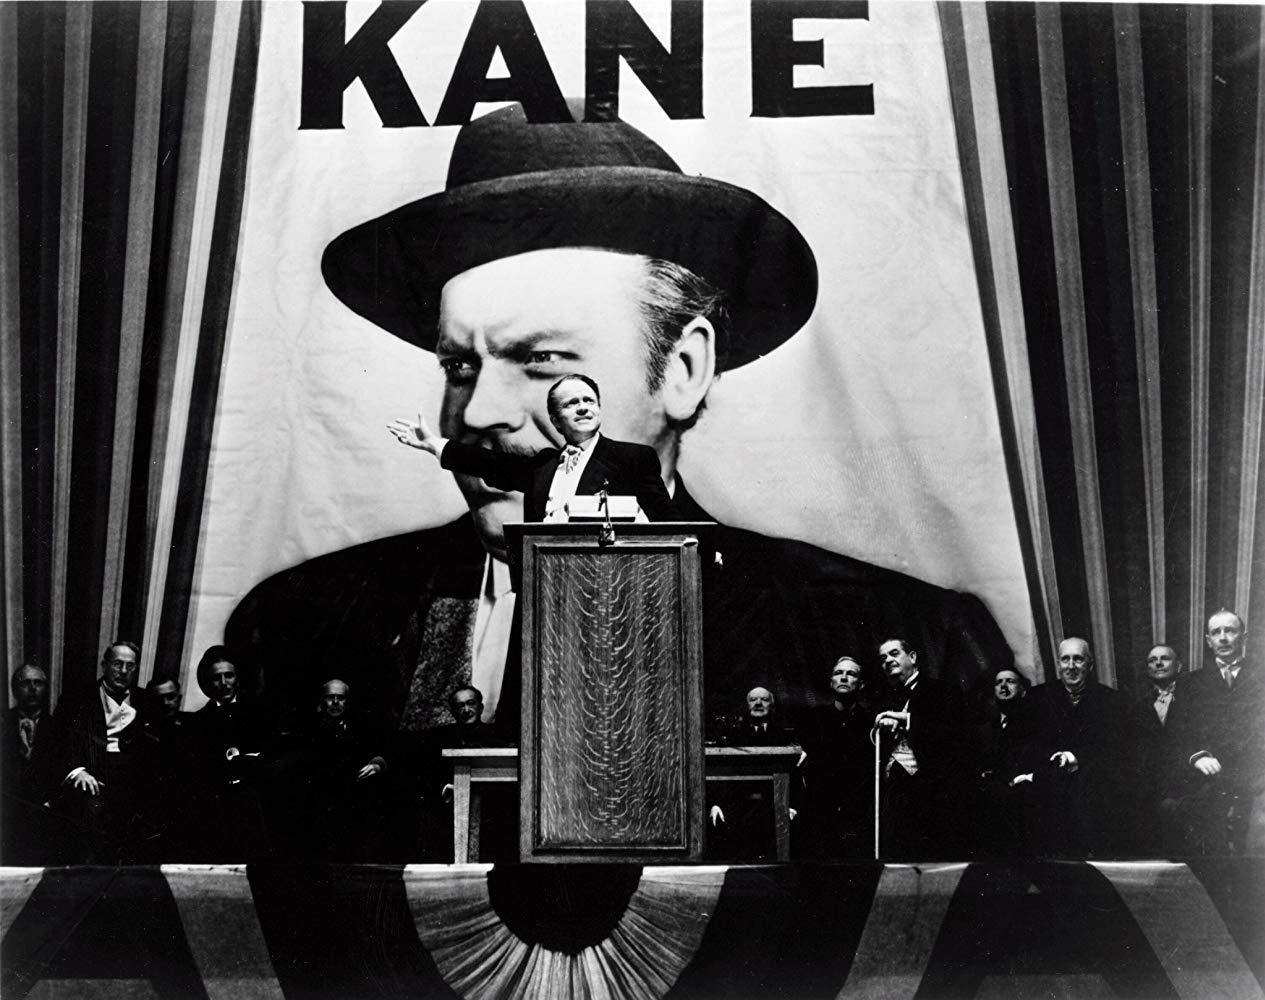 CITIZEN KANE - 10 فیلم برتر سیاه و سفید کلاسیک تاریخ سینما